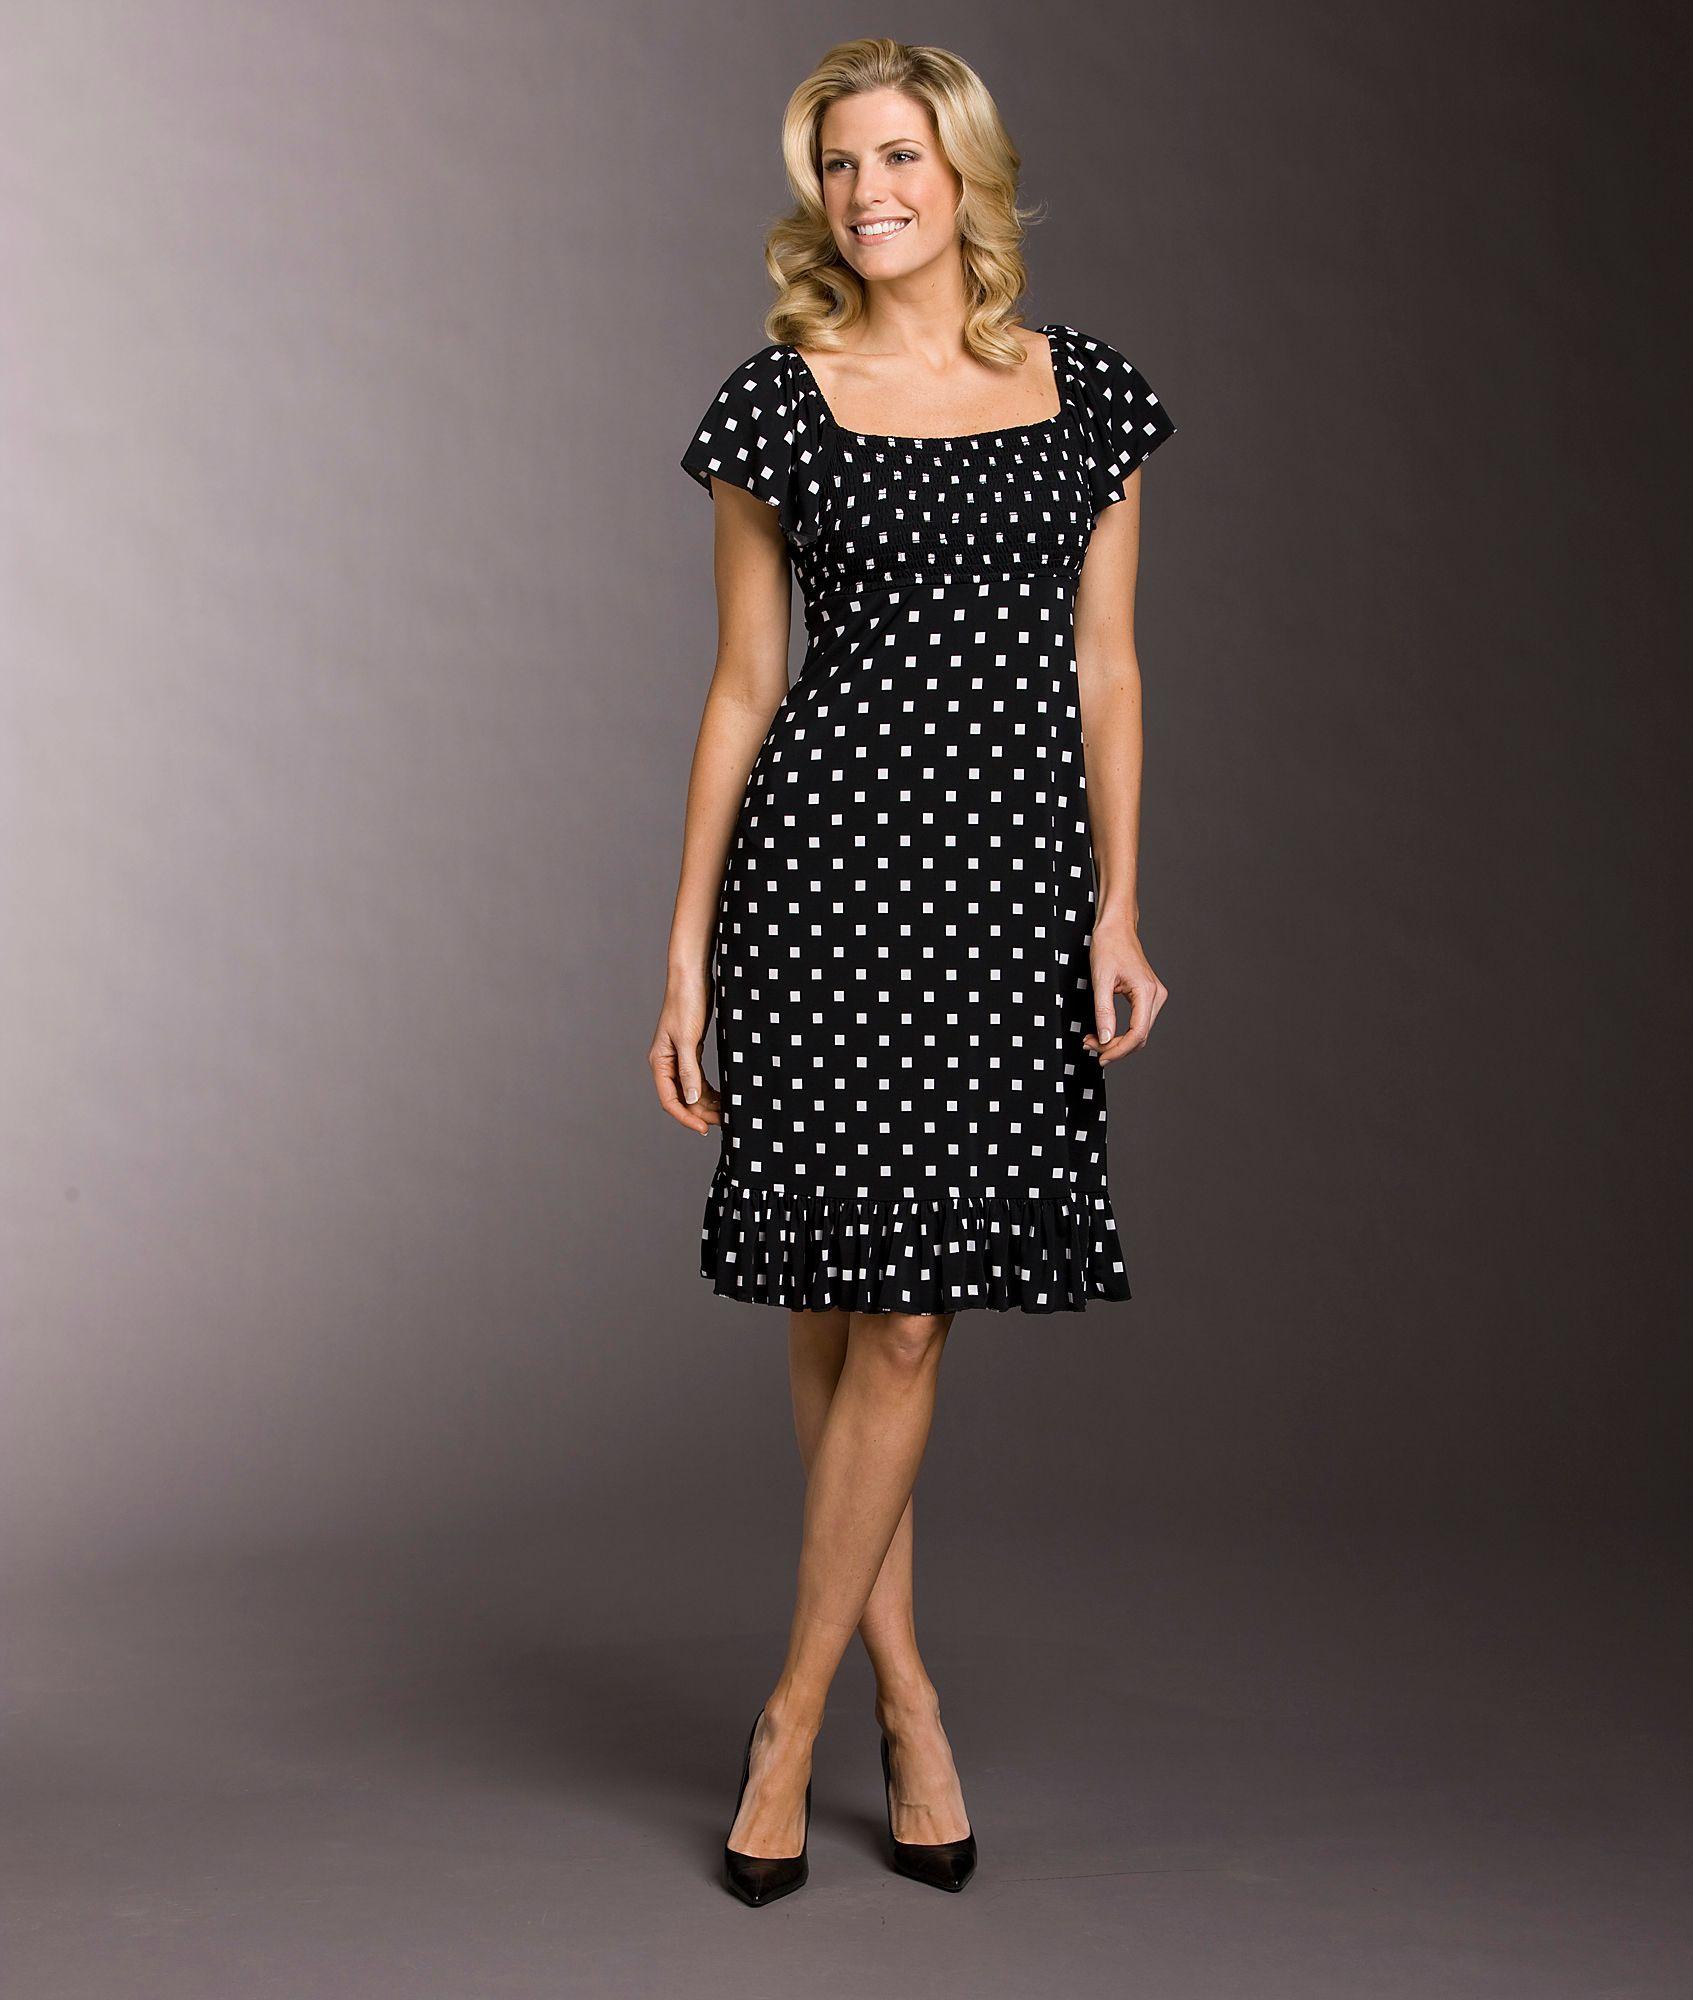 Herbergers ---- dress----Kasey Krull----203590---- | Kasey ...